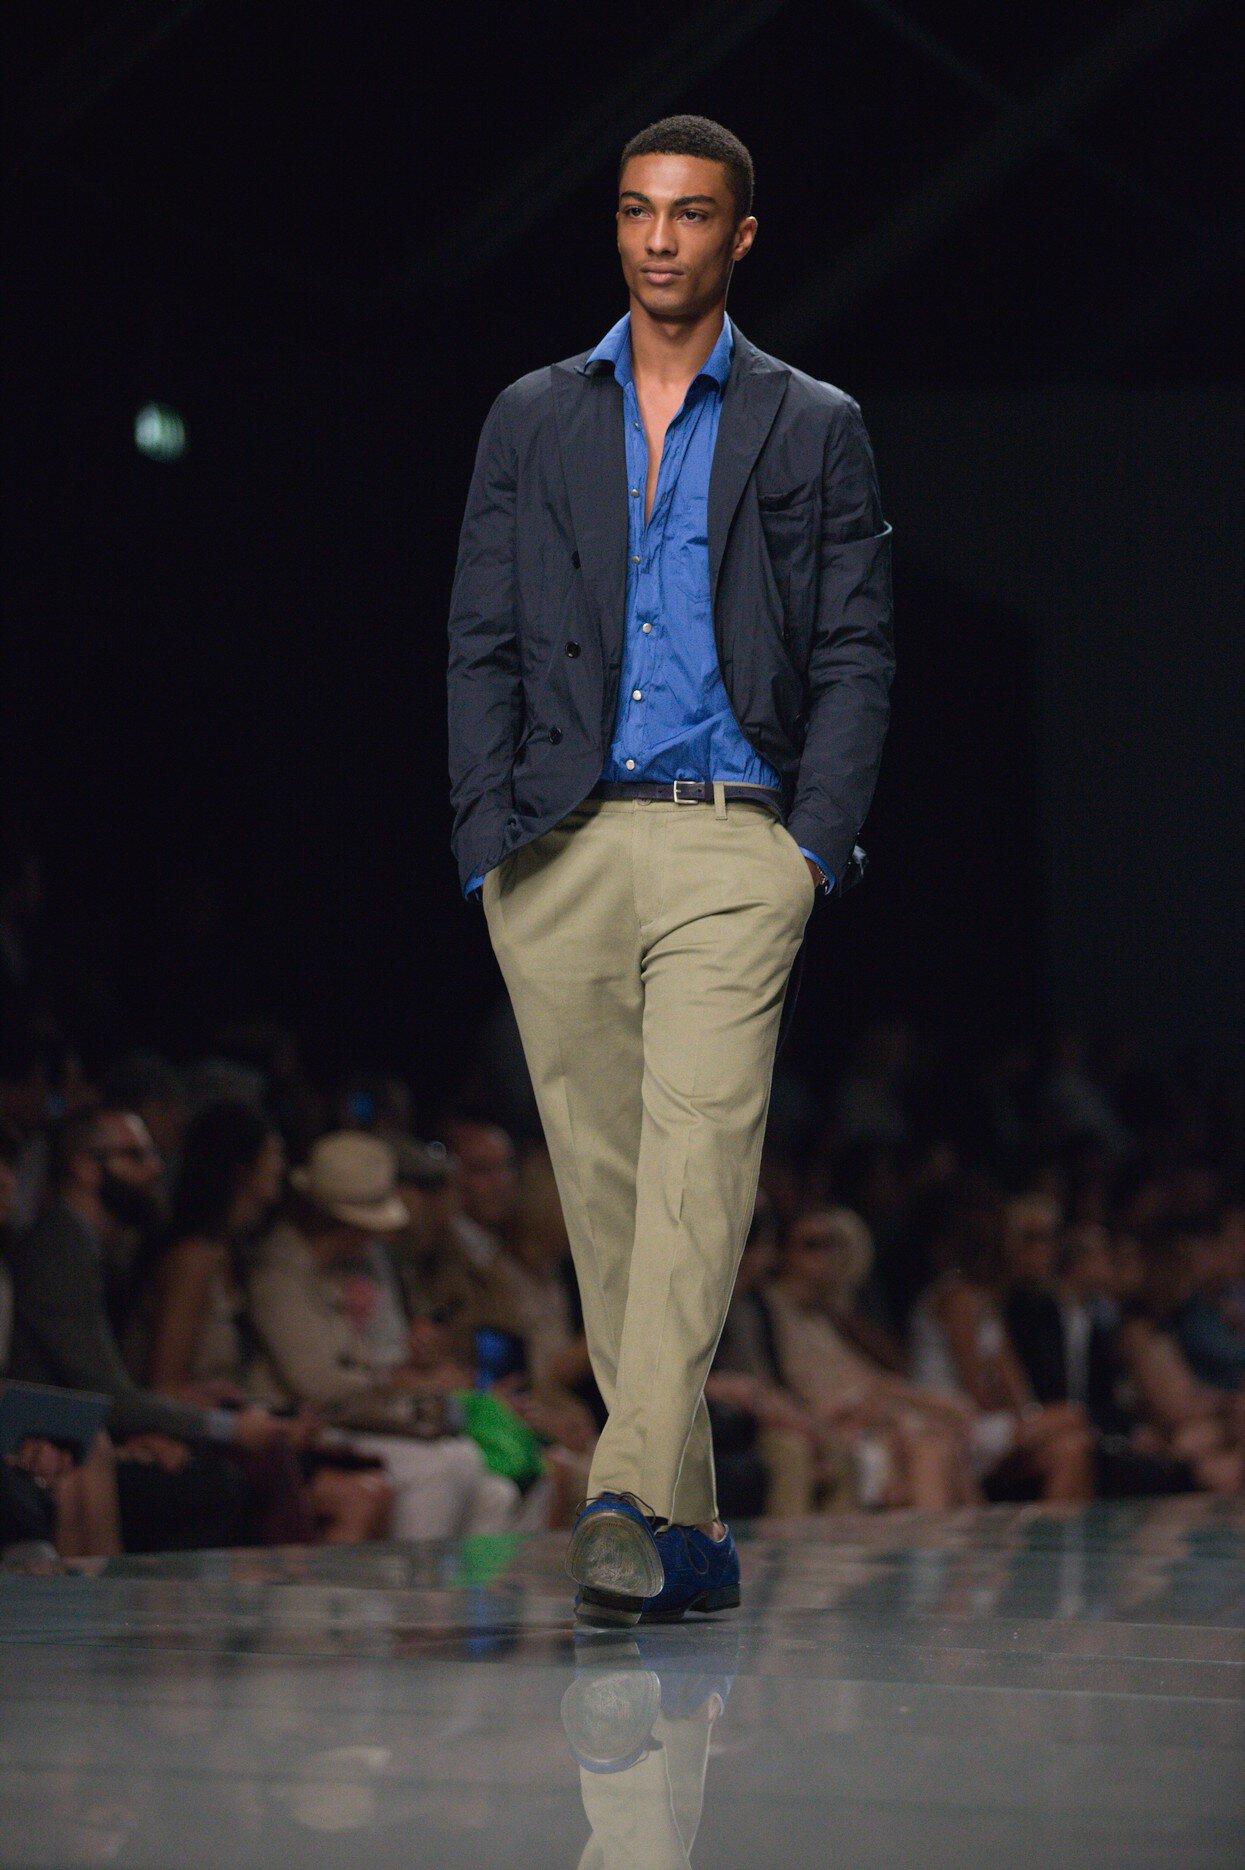 Ermanno Scervino Spring Summer 2013 Men Collection Milano Fashion Week Fashion Show